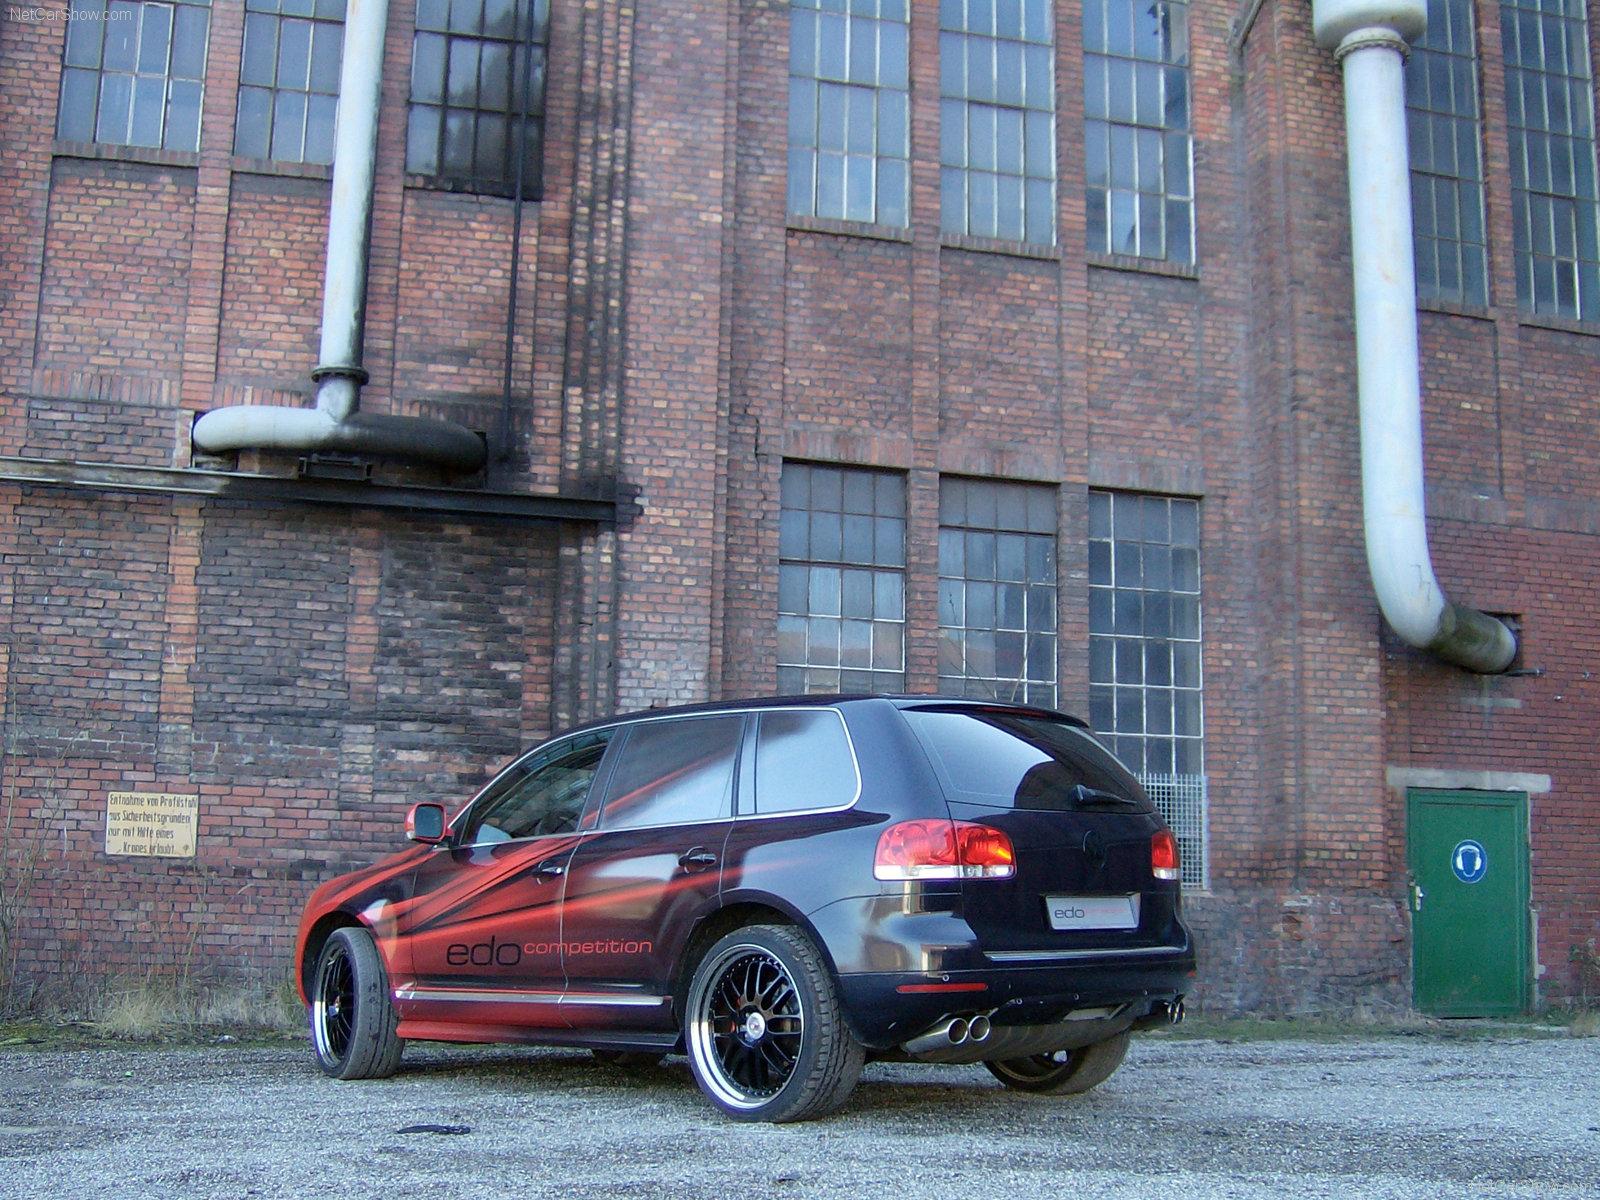 Hình ảnh siêu xe Edo Volkswagen Touareg Red-Black 2006 & nội ngoại thất